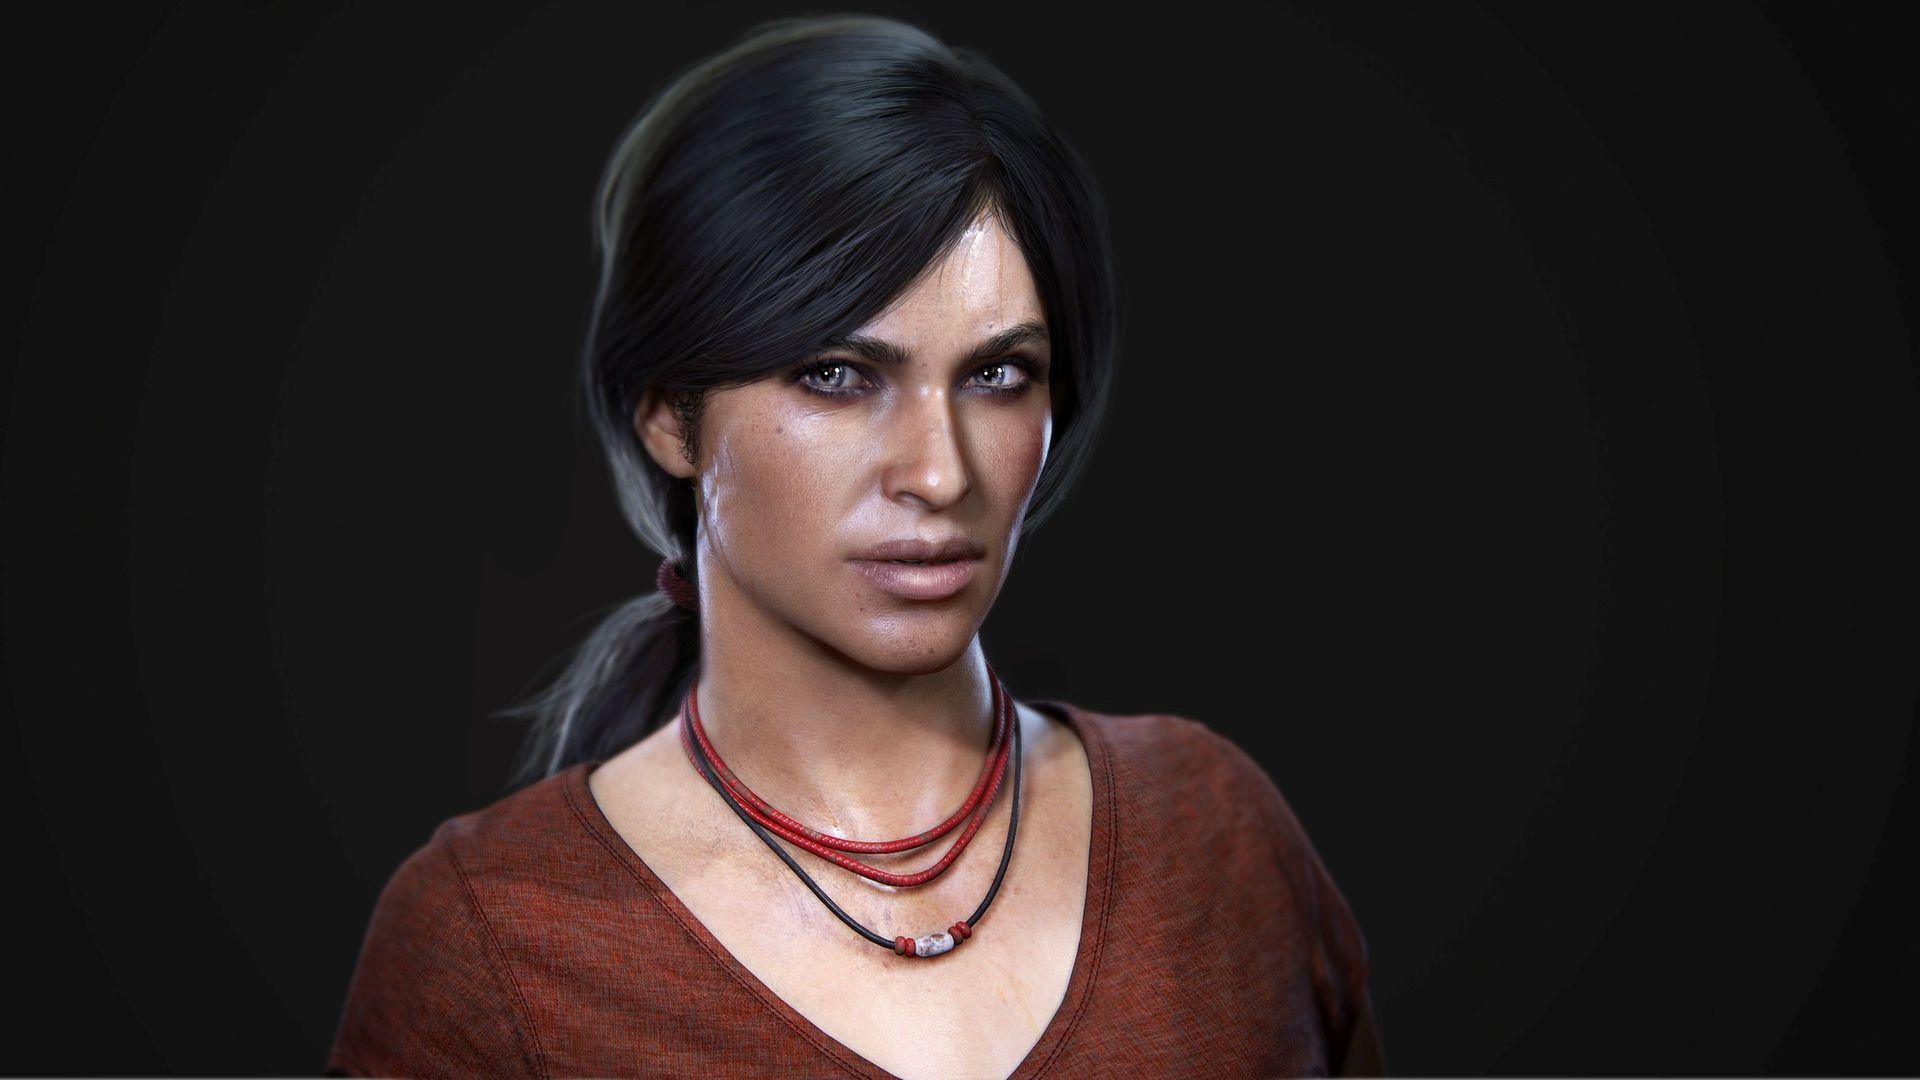 Naughty Dog explica mudanças em Chloe em Uncharted: The Lost Legacy